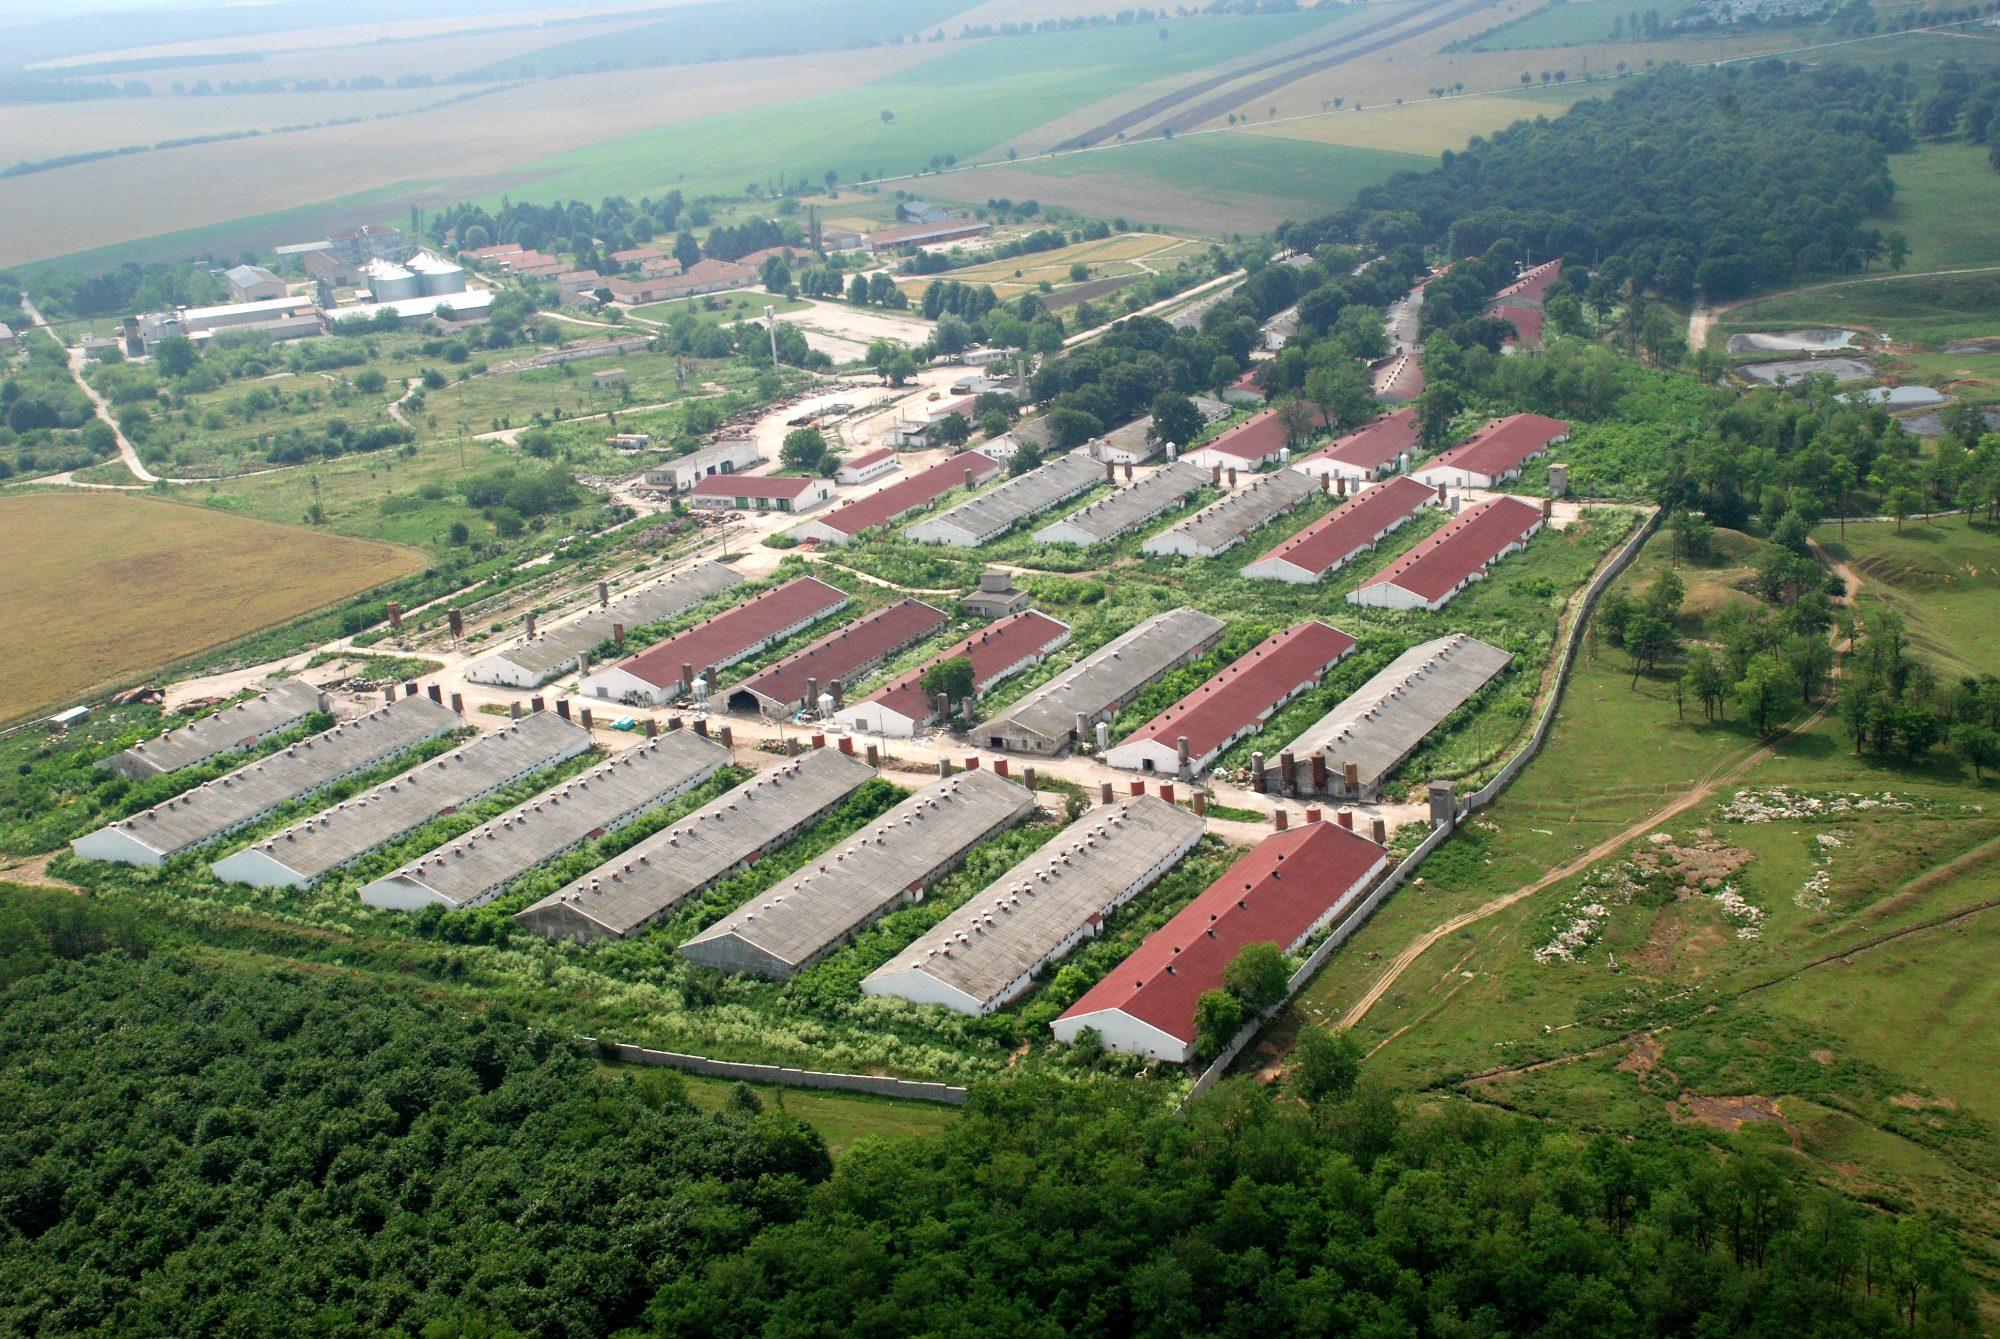 The Pig Farm Agrotime